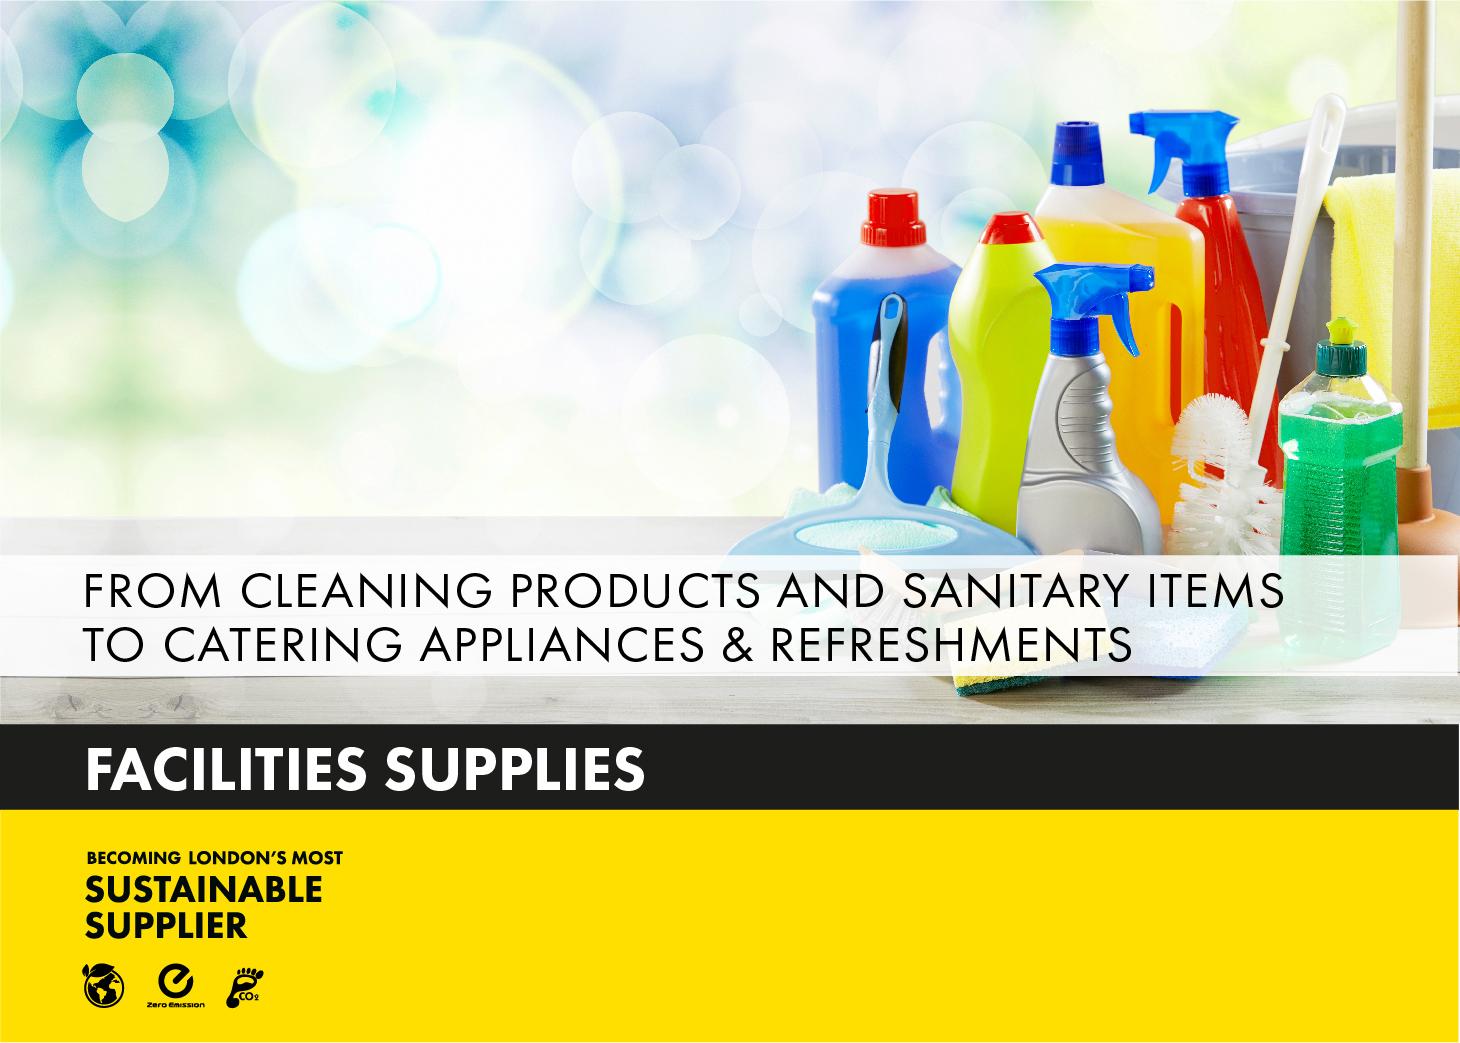 Facilities Supplies